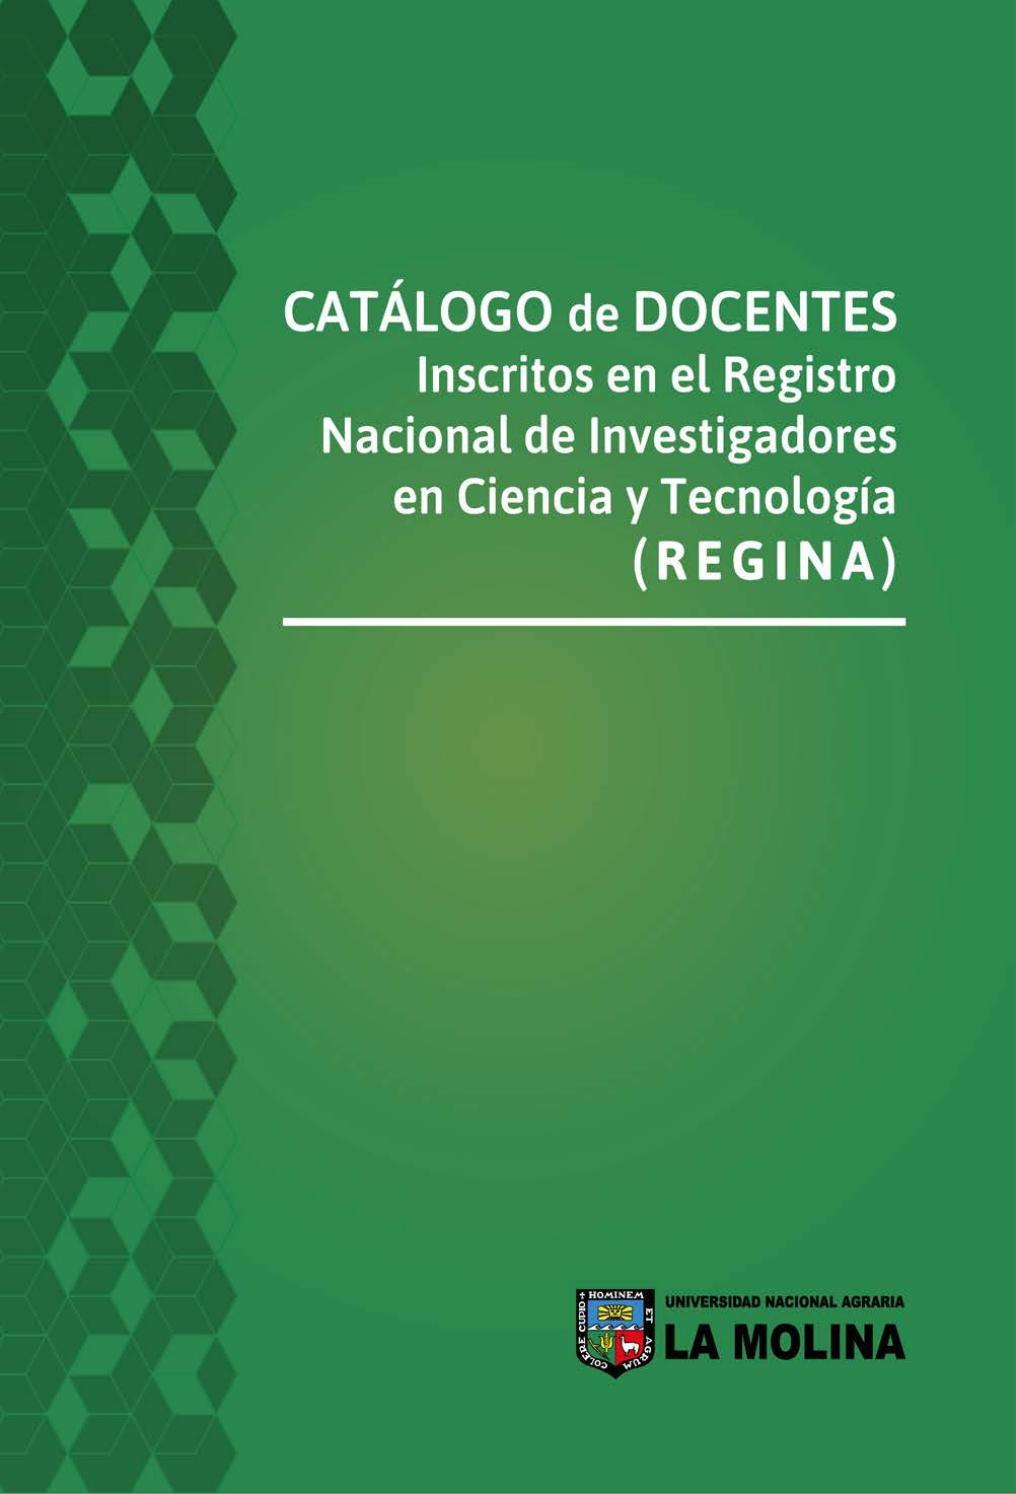 Catalogo REGINA - UNALM by compendio - issuu